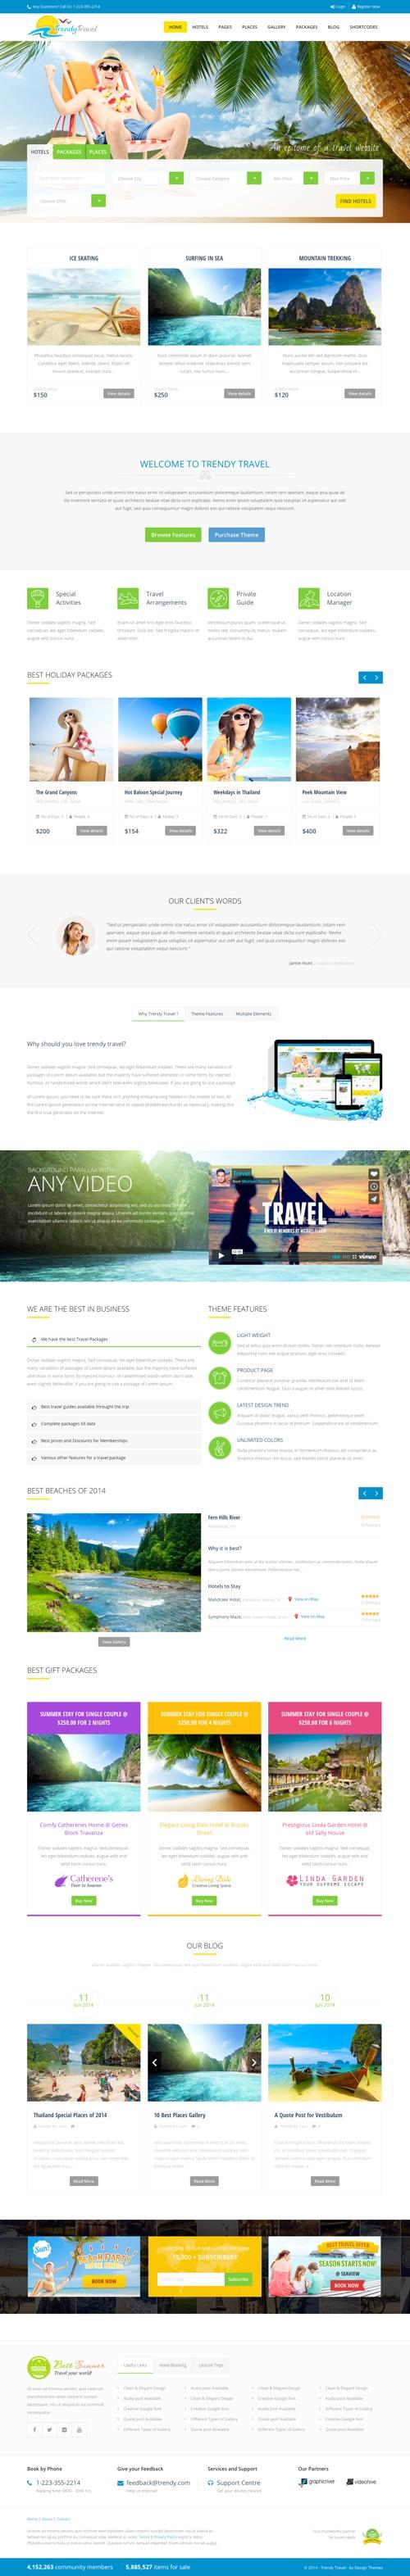 voyage travel agency wordpress theme free download